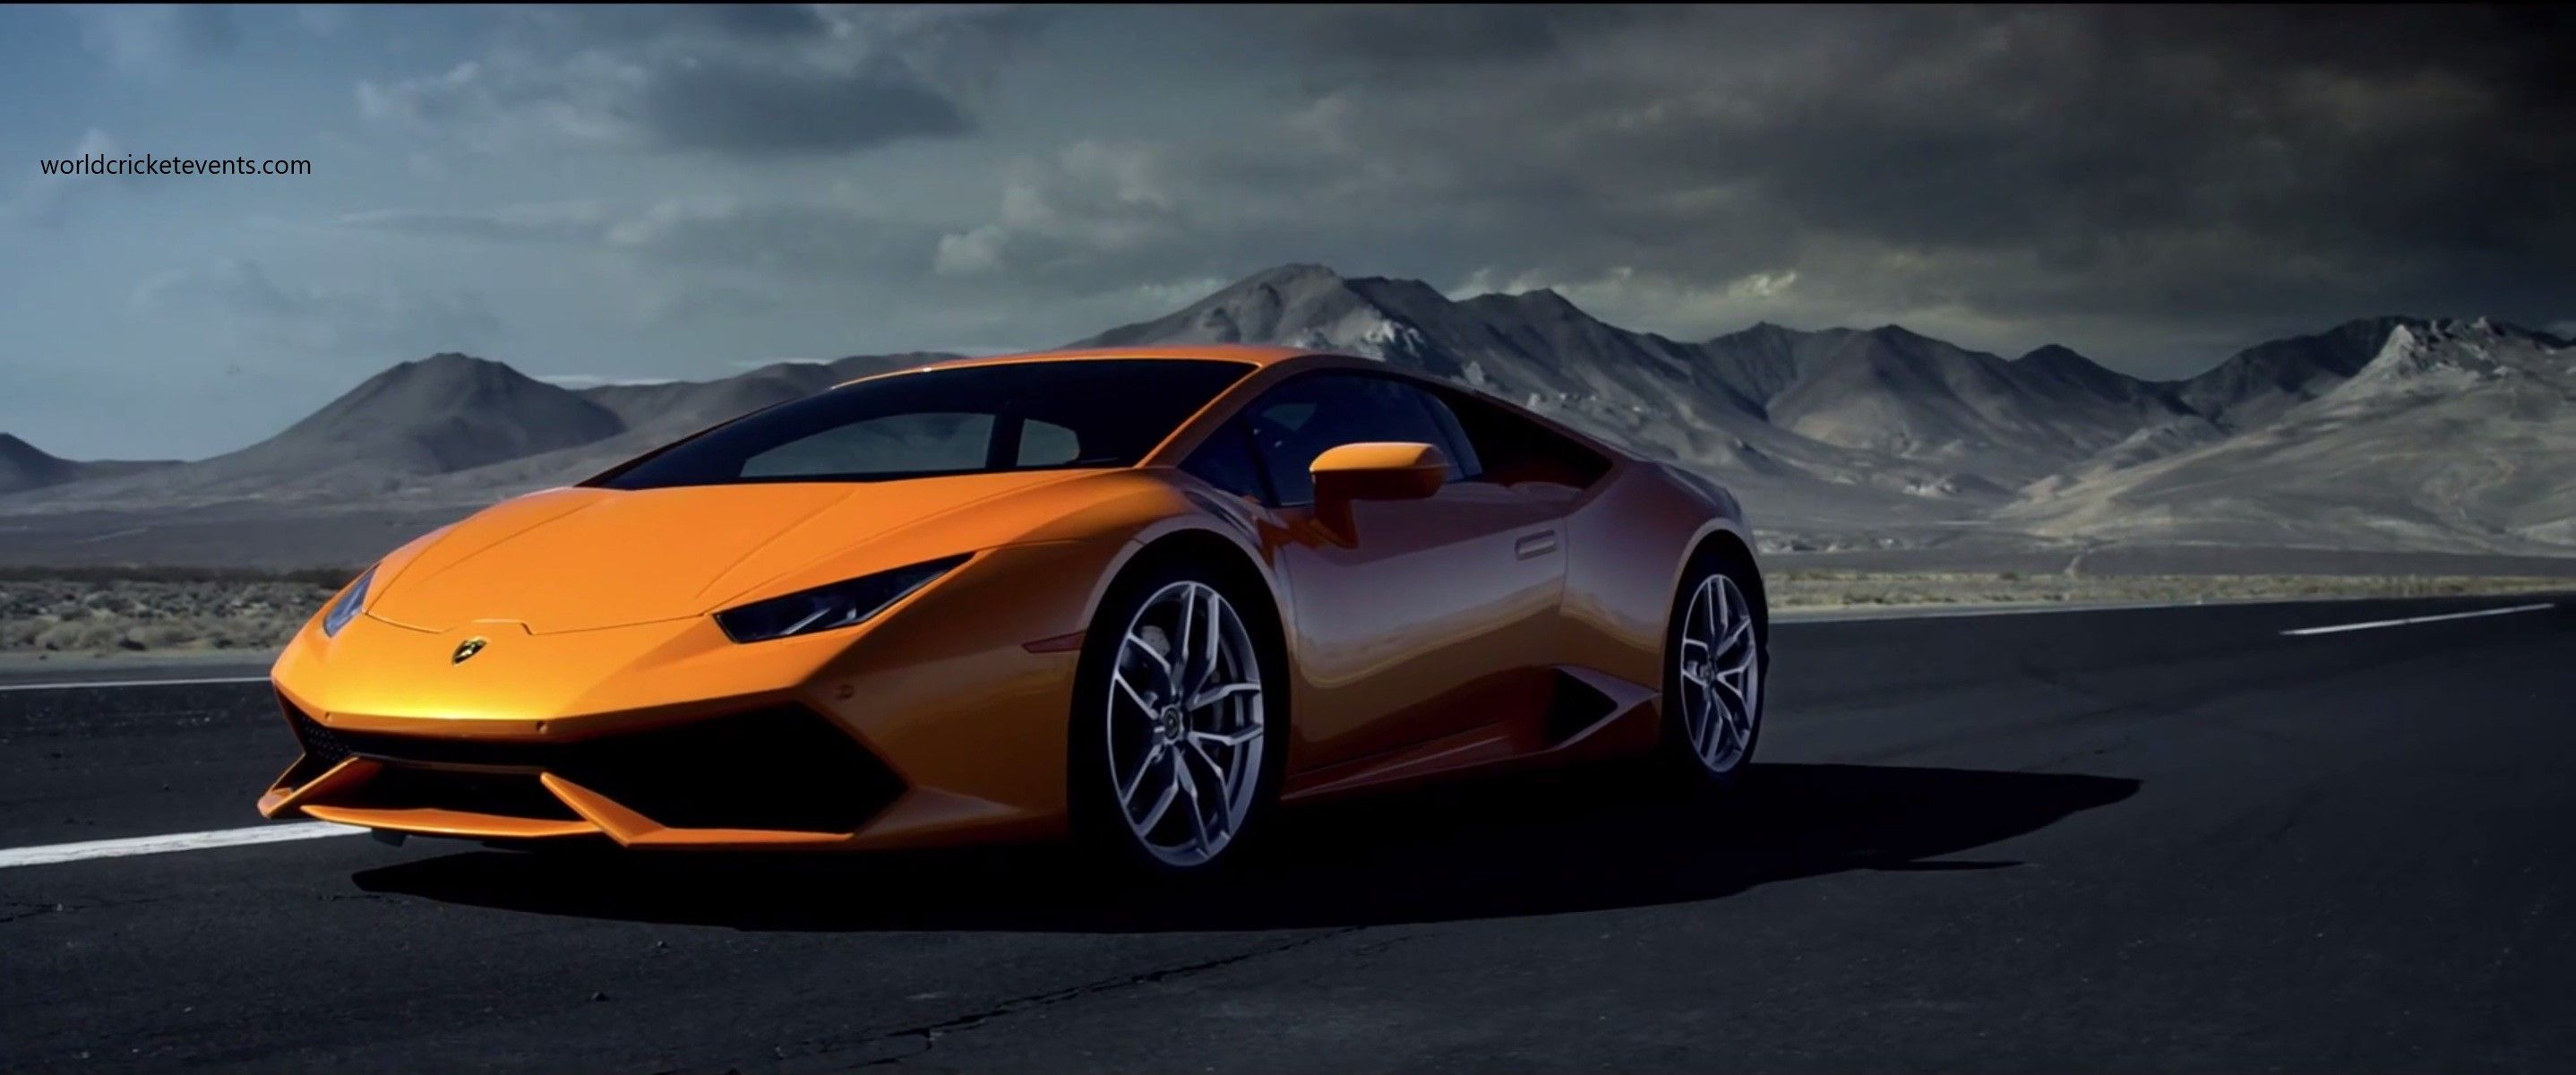 super car hd wallpapers http